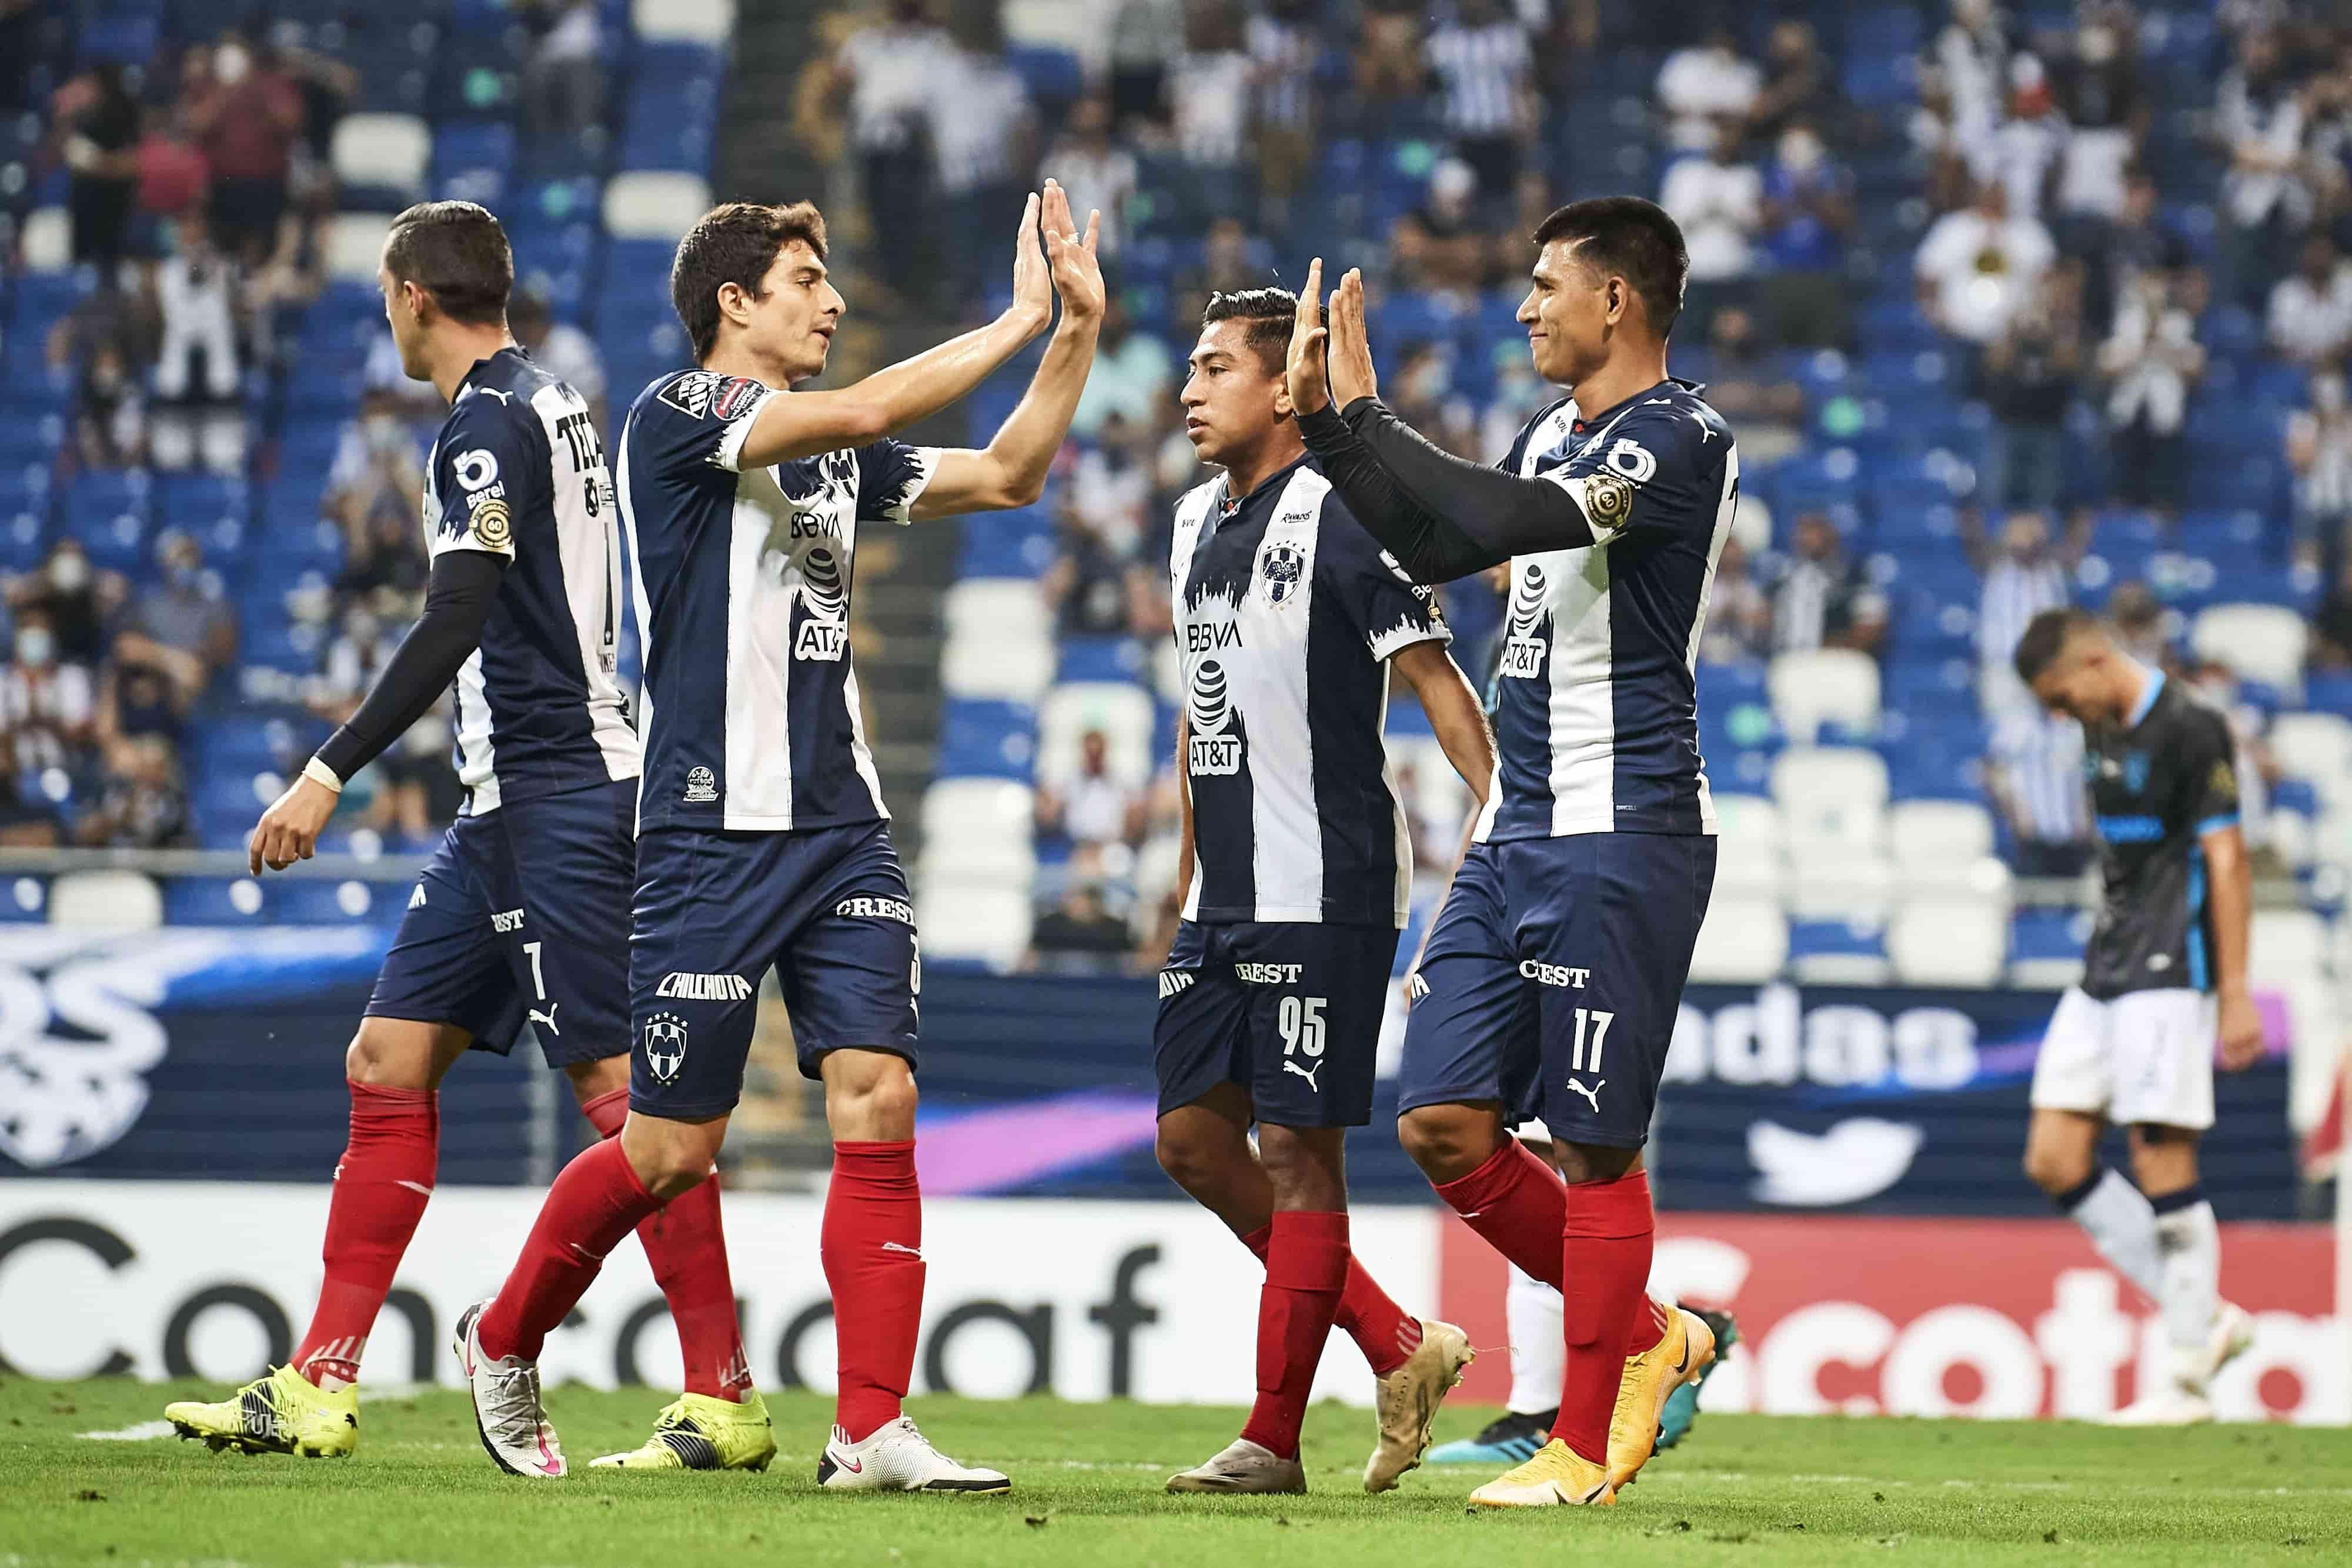 CF Monterrey  (6) 3-1 (1) Atletico Pantoja